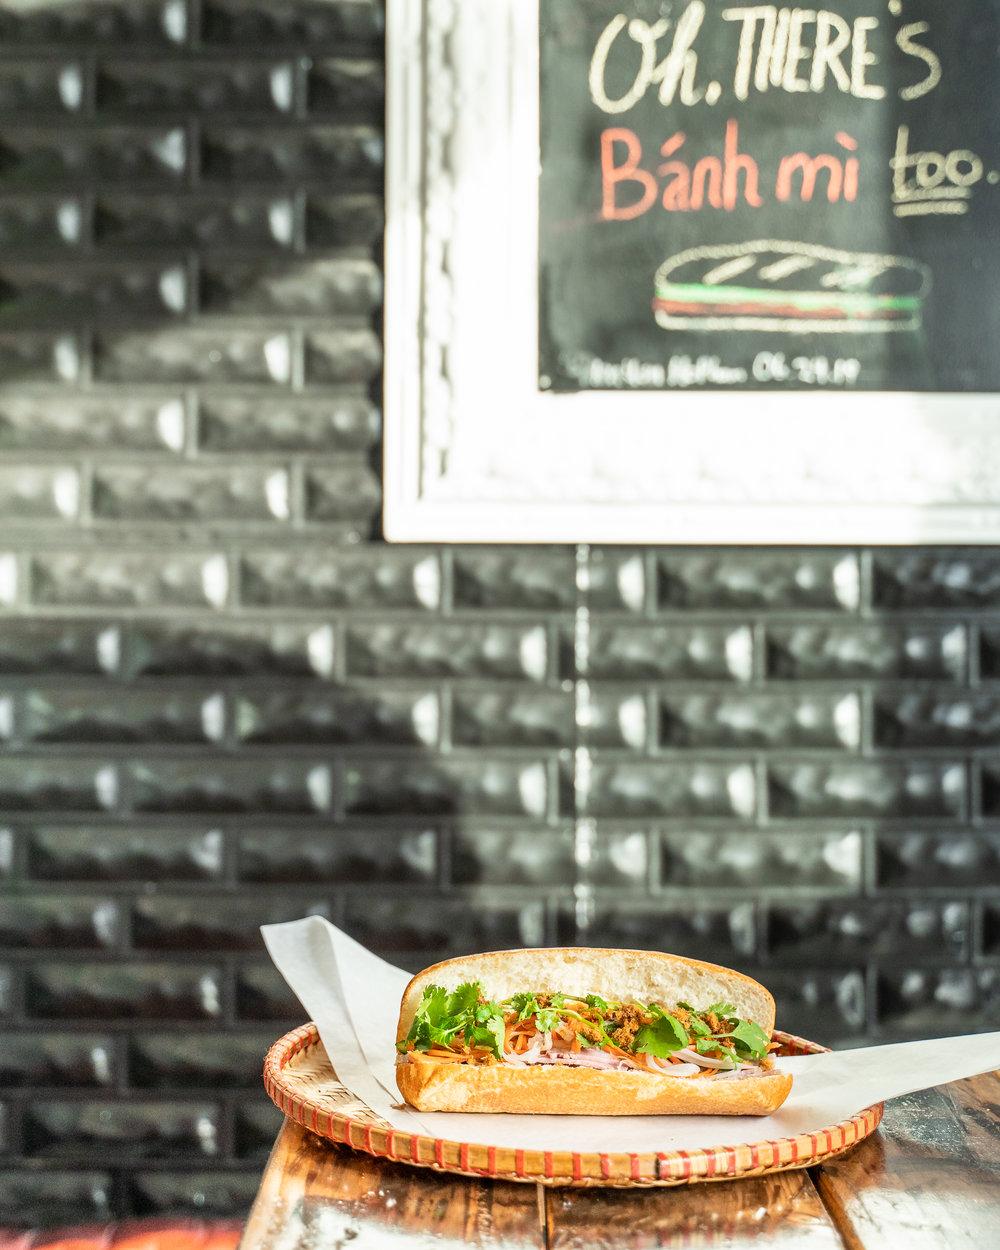 bahn mi food photography jeremy pawlowski canyon creative company for hire.jpg